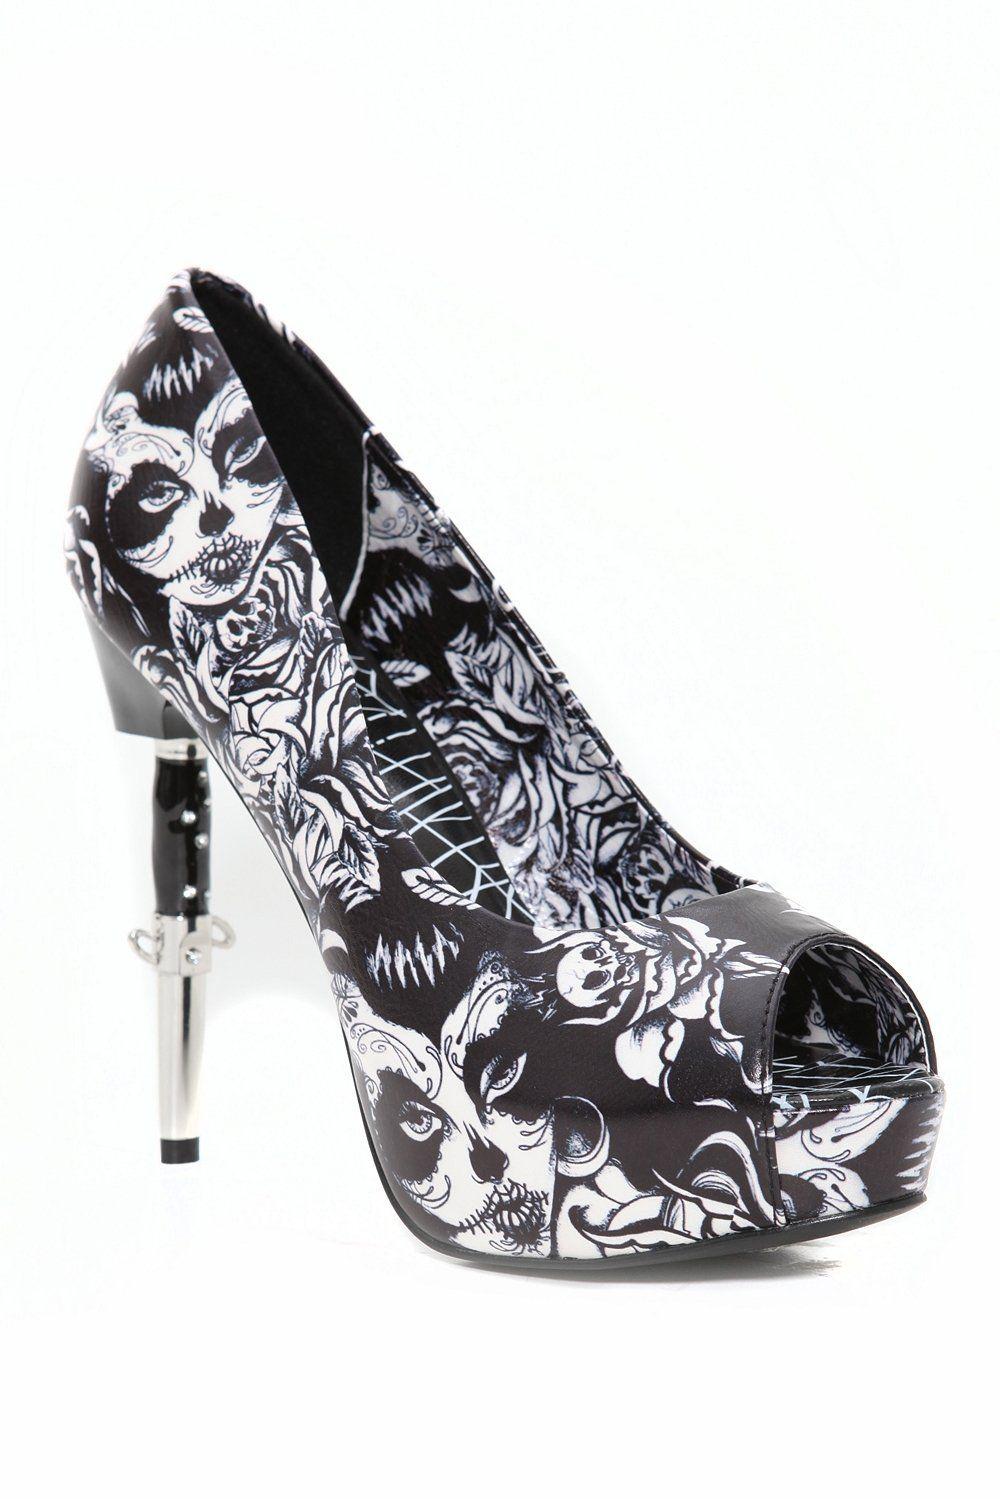 black white high heels shoes